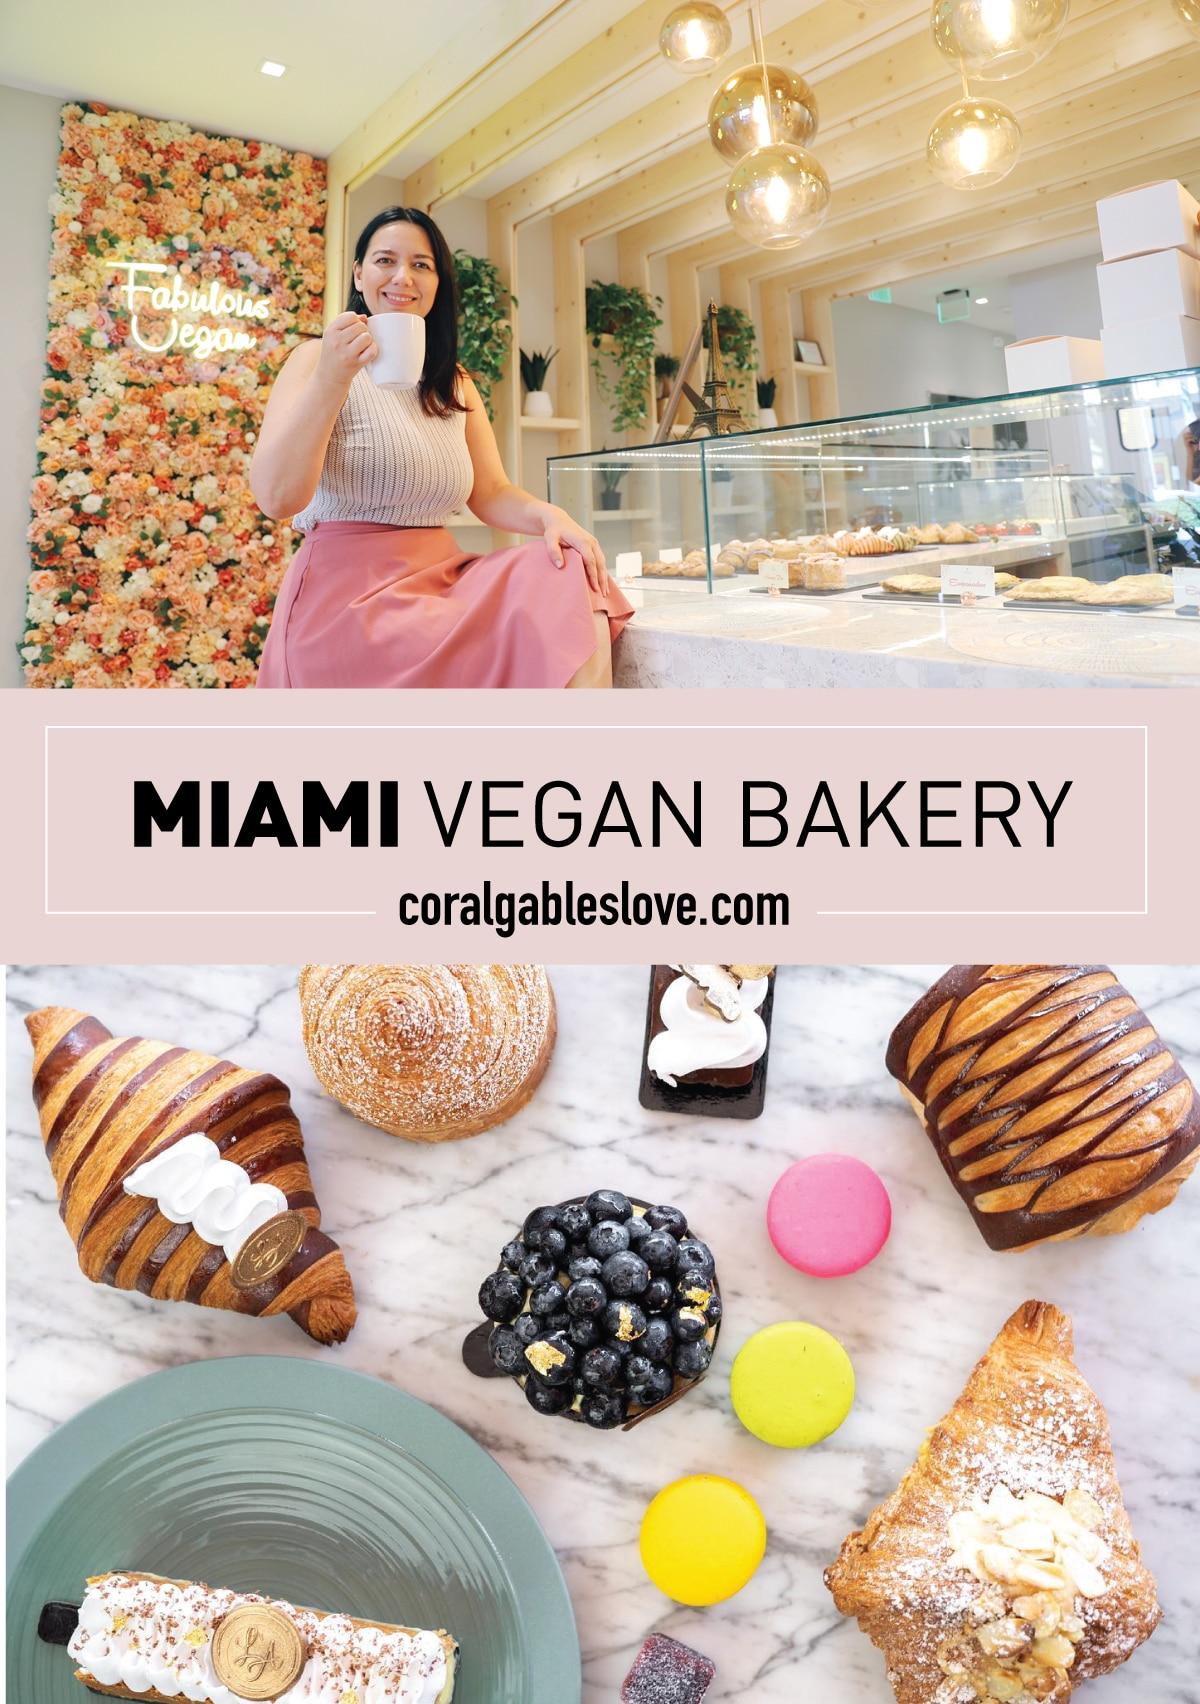 Miami Vegan BAkery L'Artisane in Coral Gables, Florida